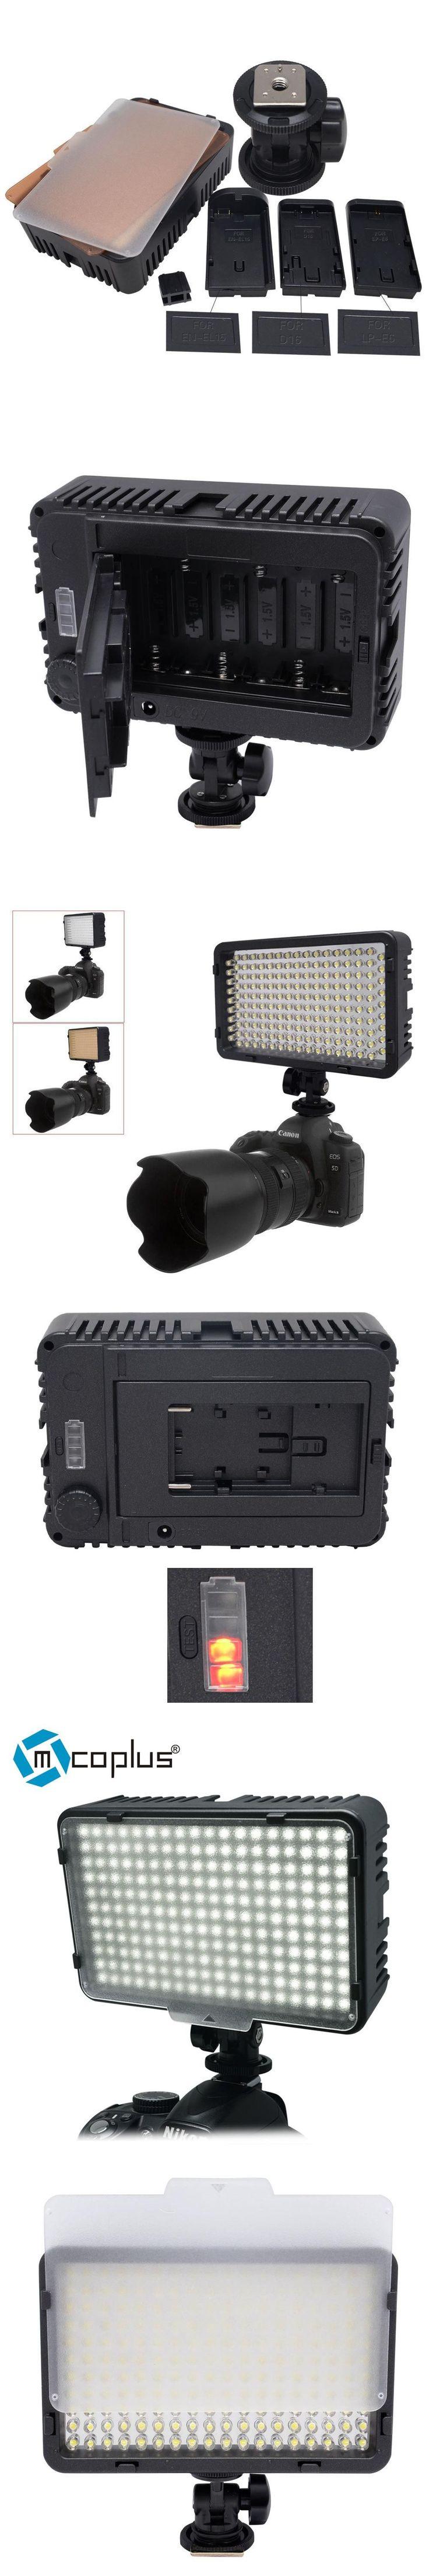 Mcoplus 198 LED Video Photo Light Lighting Lamp for DV Camcorder & Canon Nikon Pentax Sony Panasonic Olympus Digital SLR Cameras